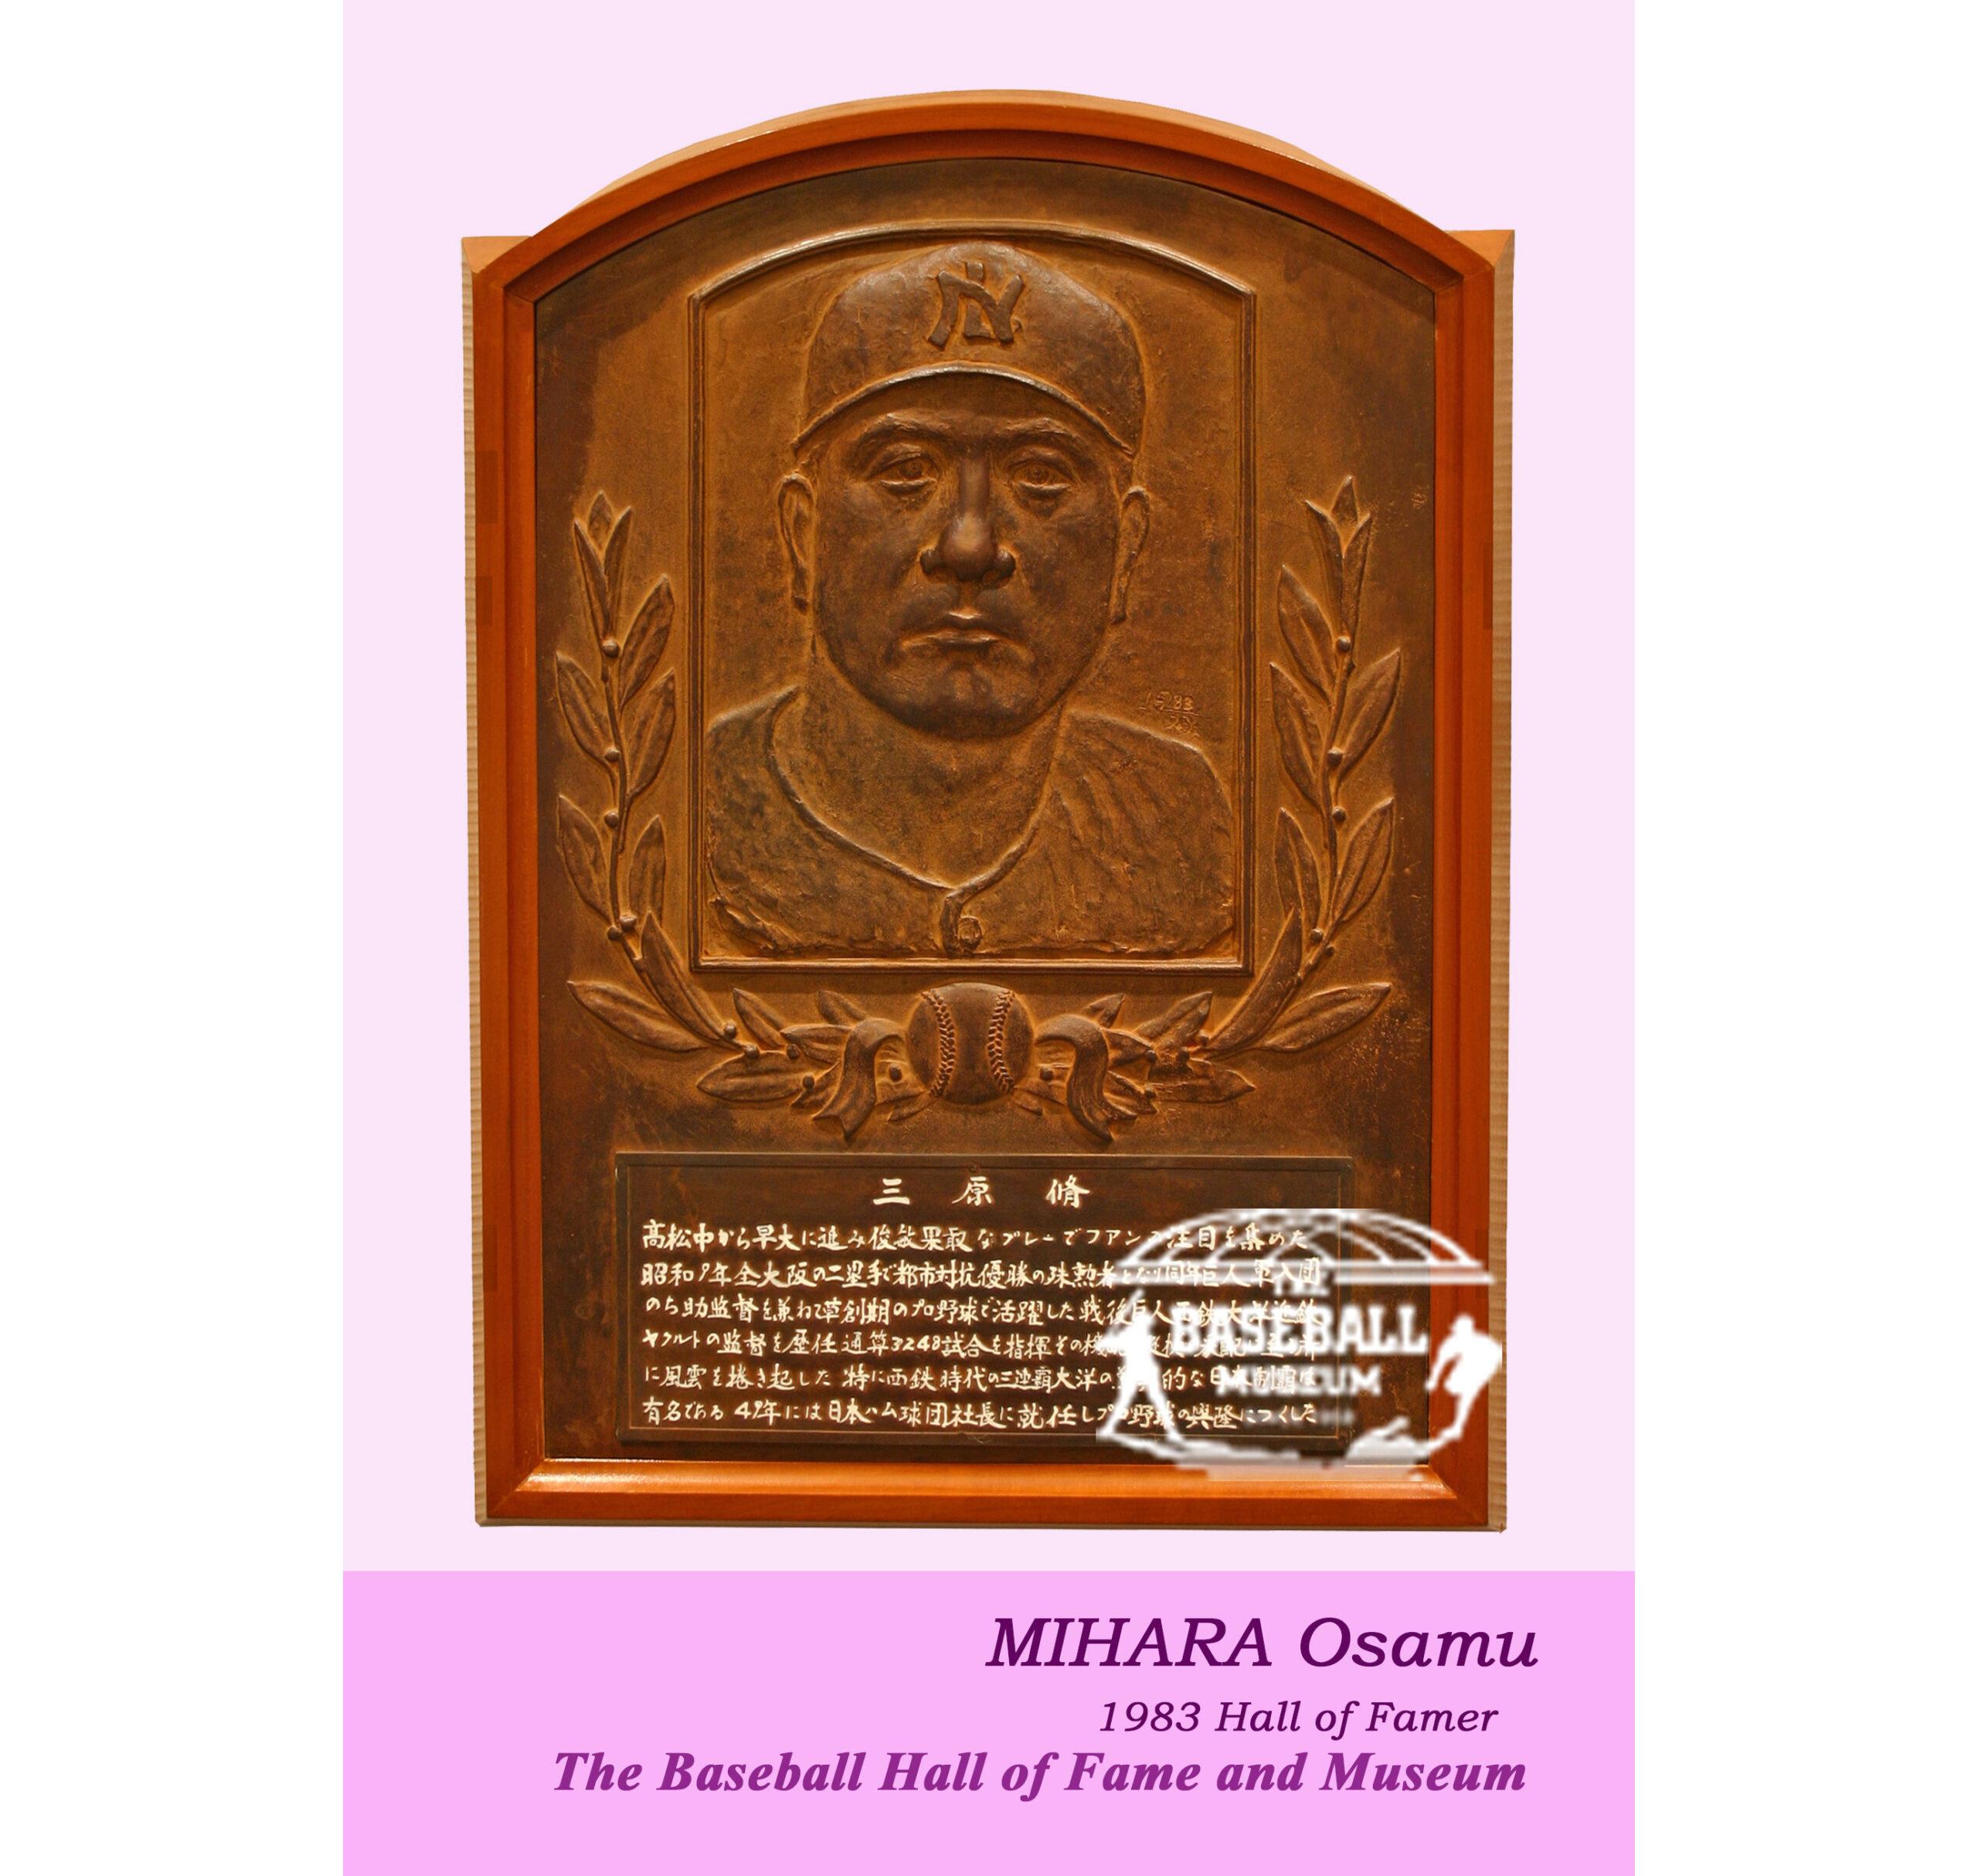 sp-postcard-mihara